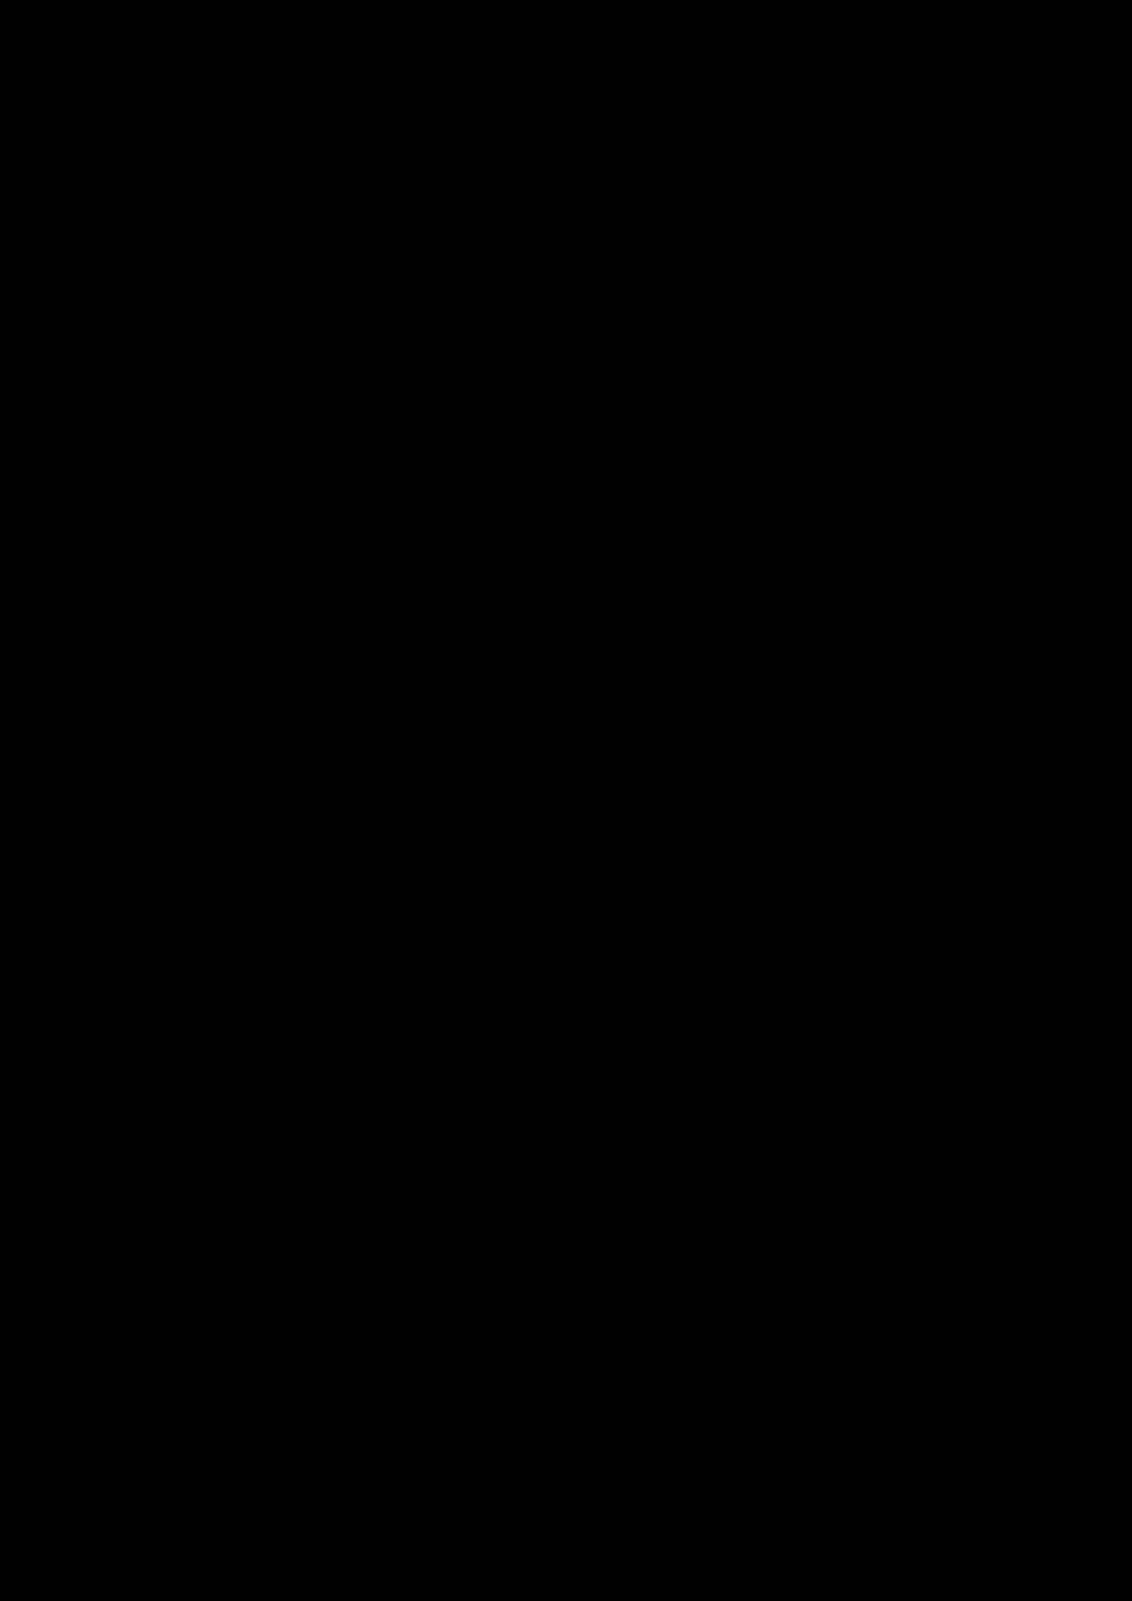 Korolevstvo slez slide, Image 80